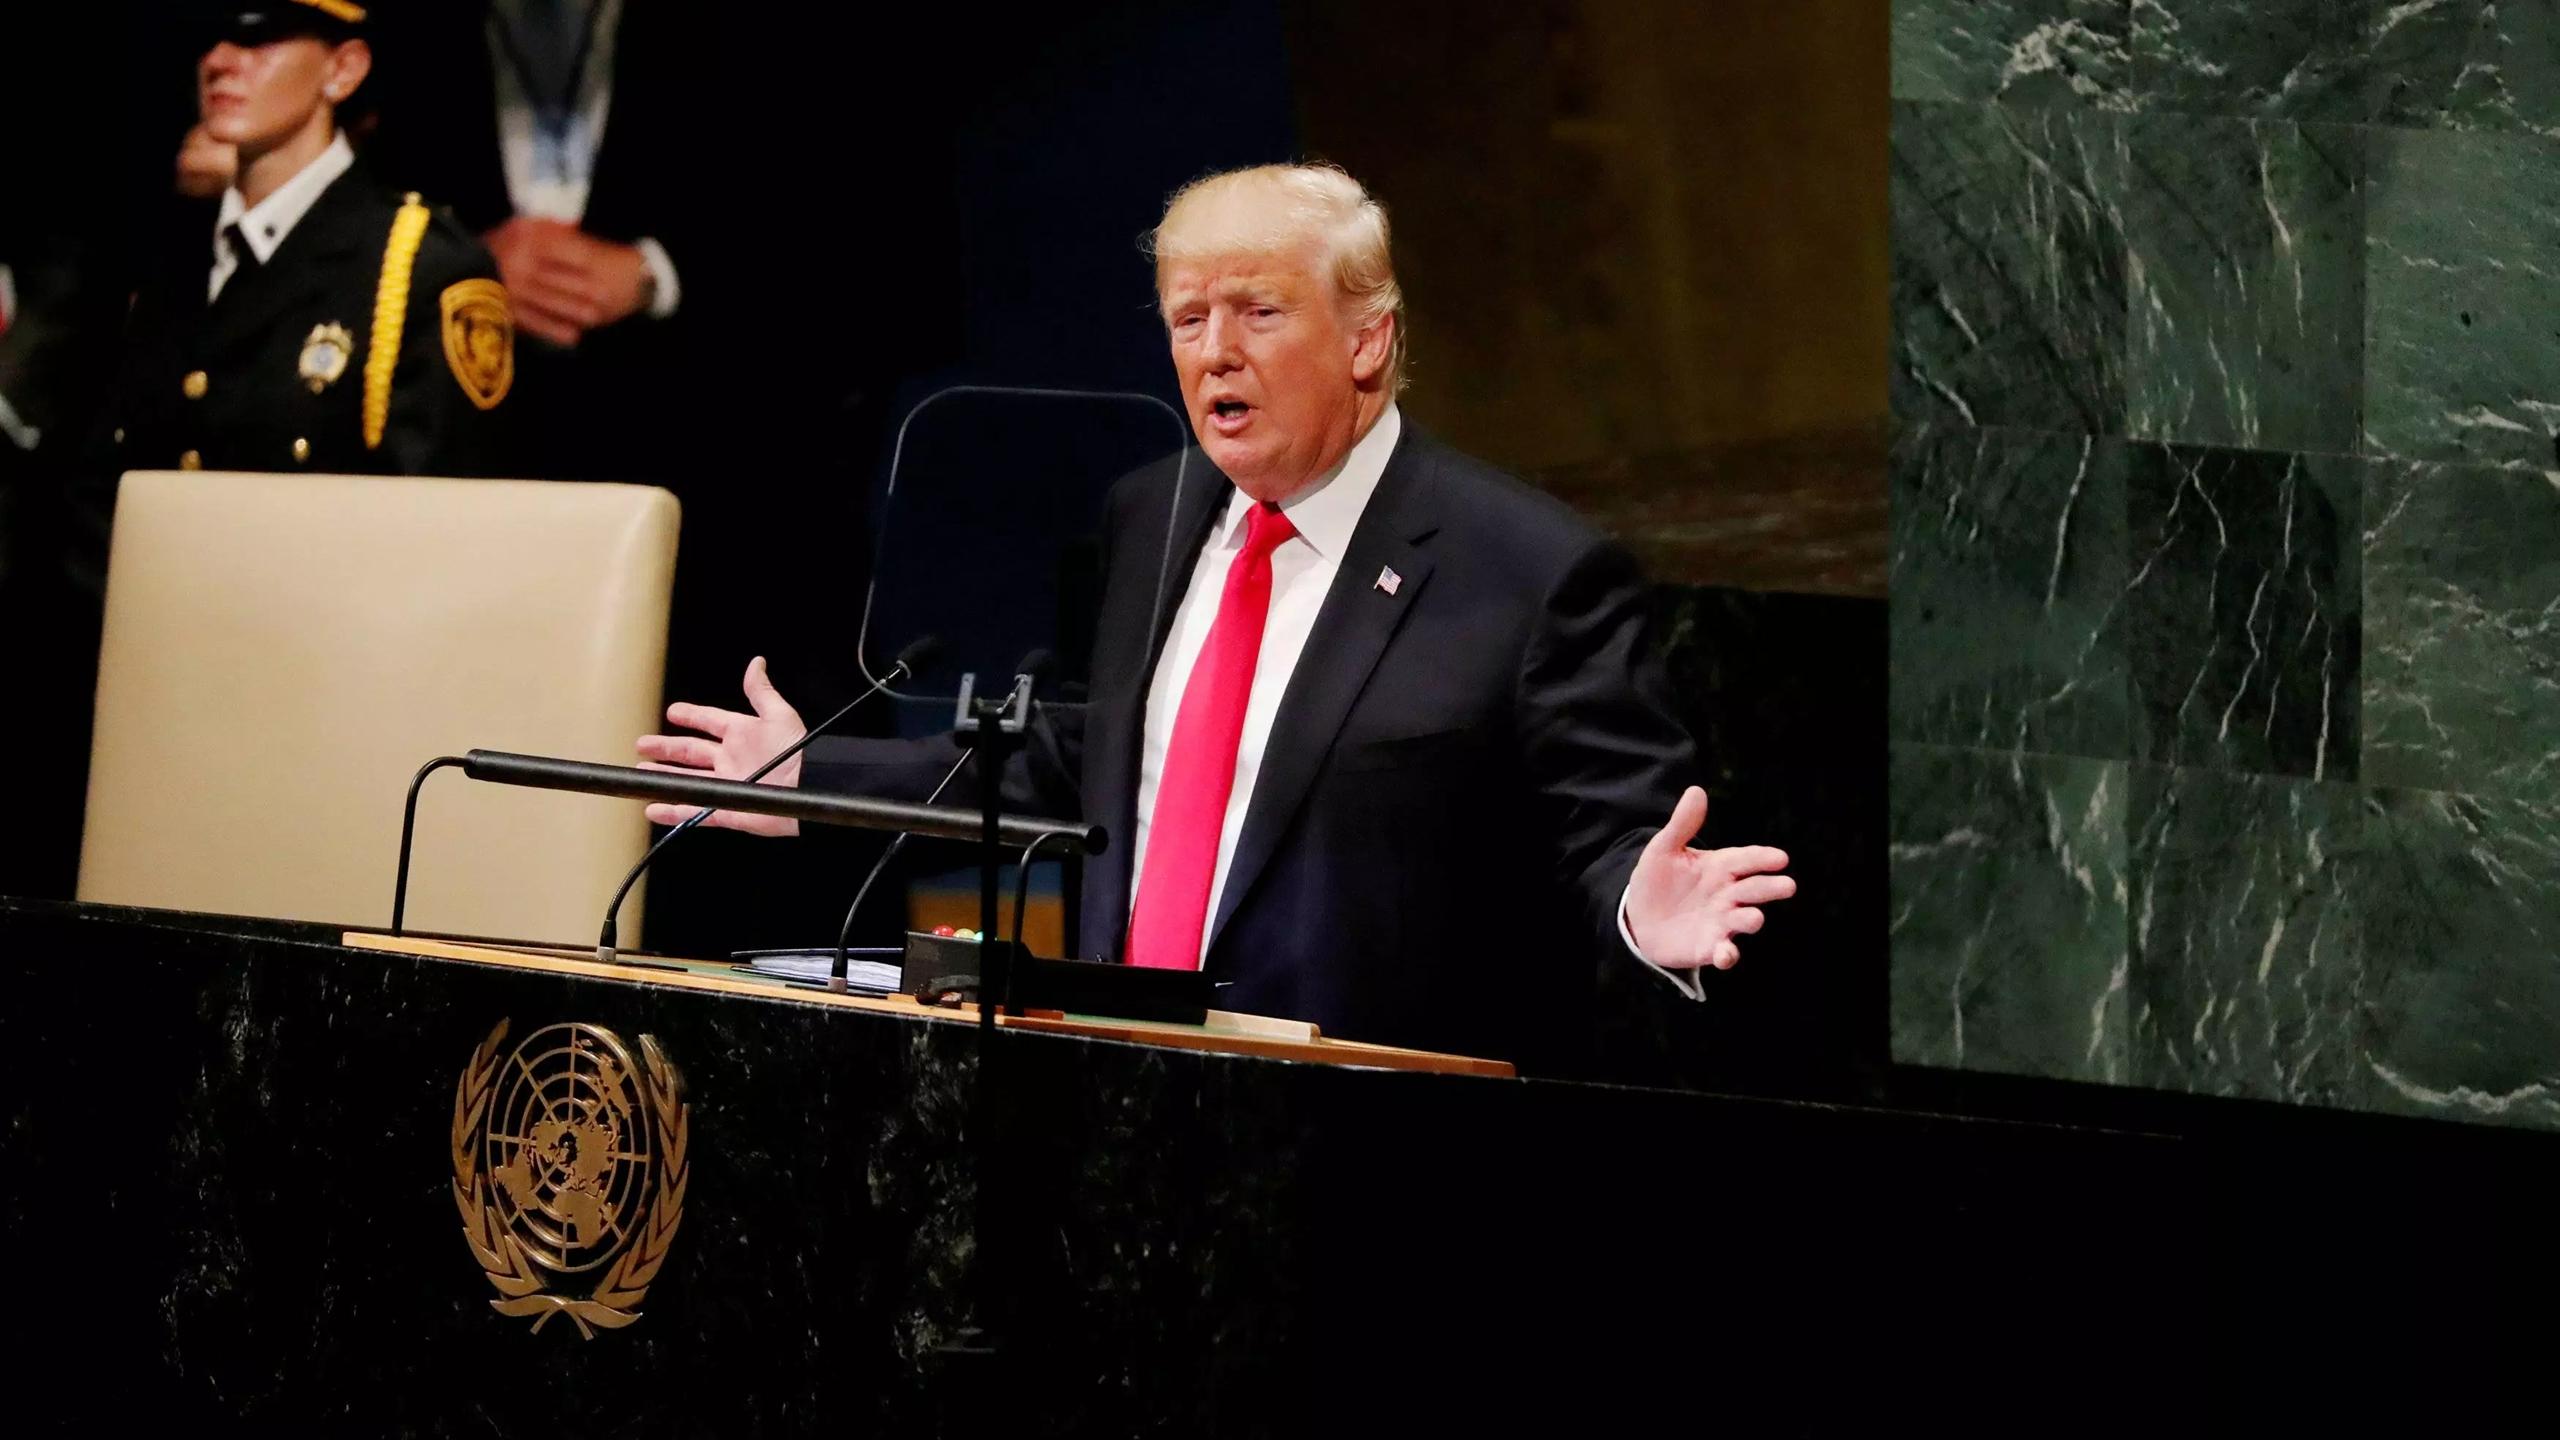 Trump y Rouhani cruzan ataques en la Asamblea General de la ONU